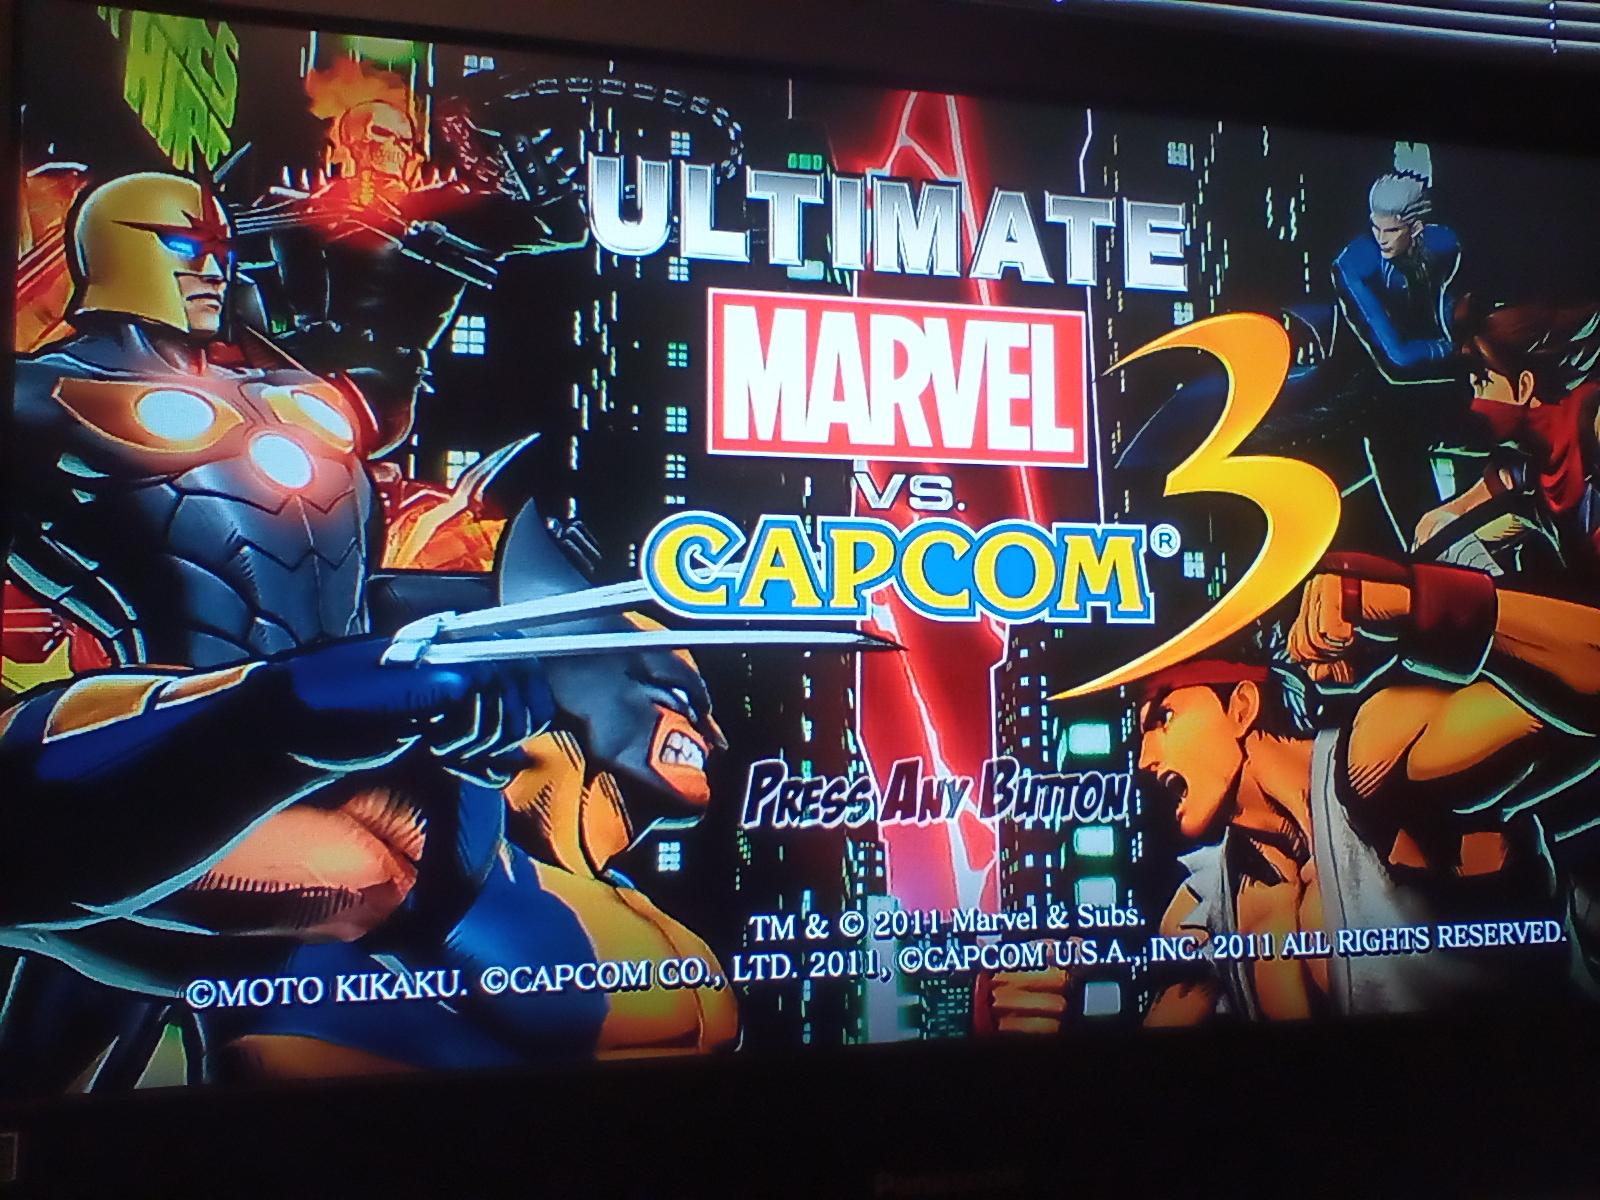 JML101582: Ultimate Marvel vs. Capcom 3 [Arcade] [Very Easy] (Playstation 3) 238,180 points on 2020-03-30 15:58:14